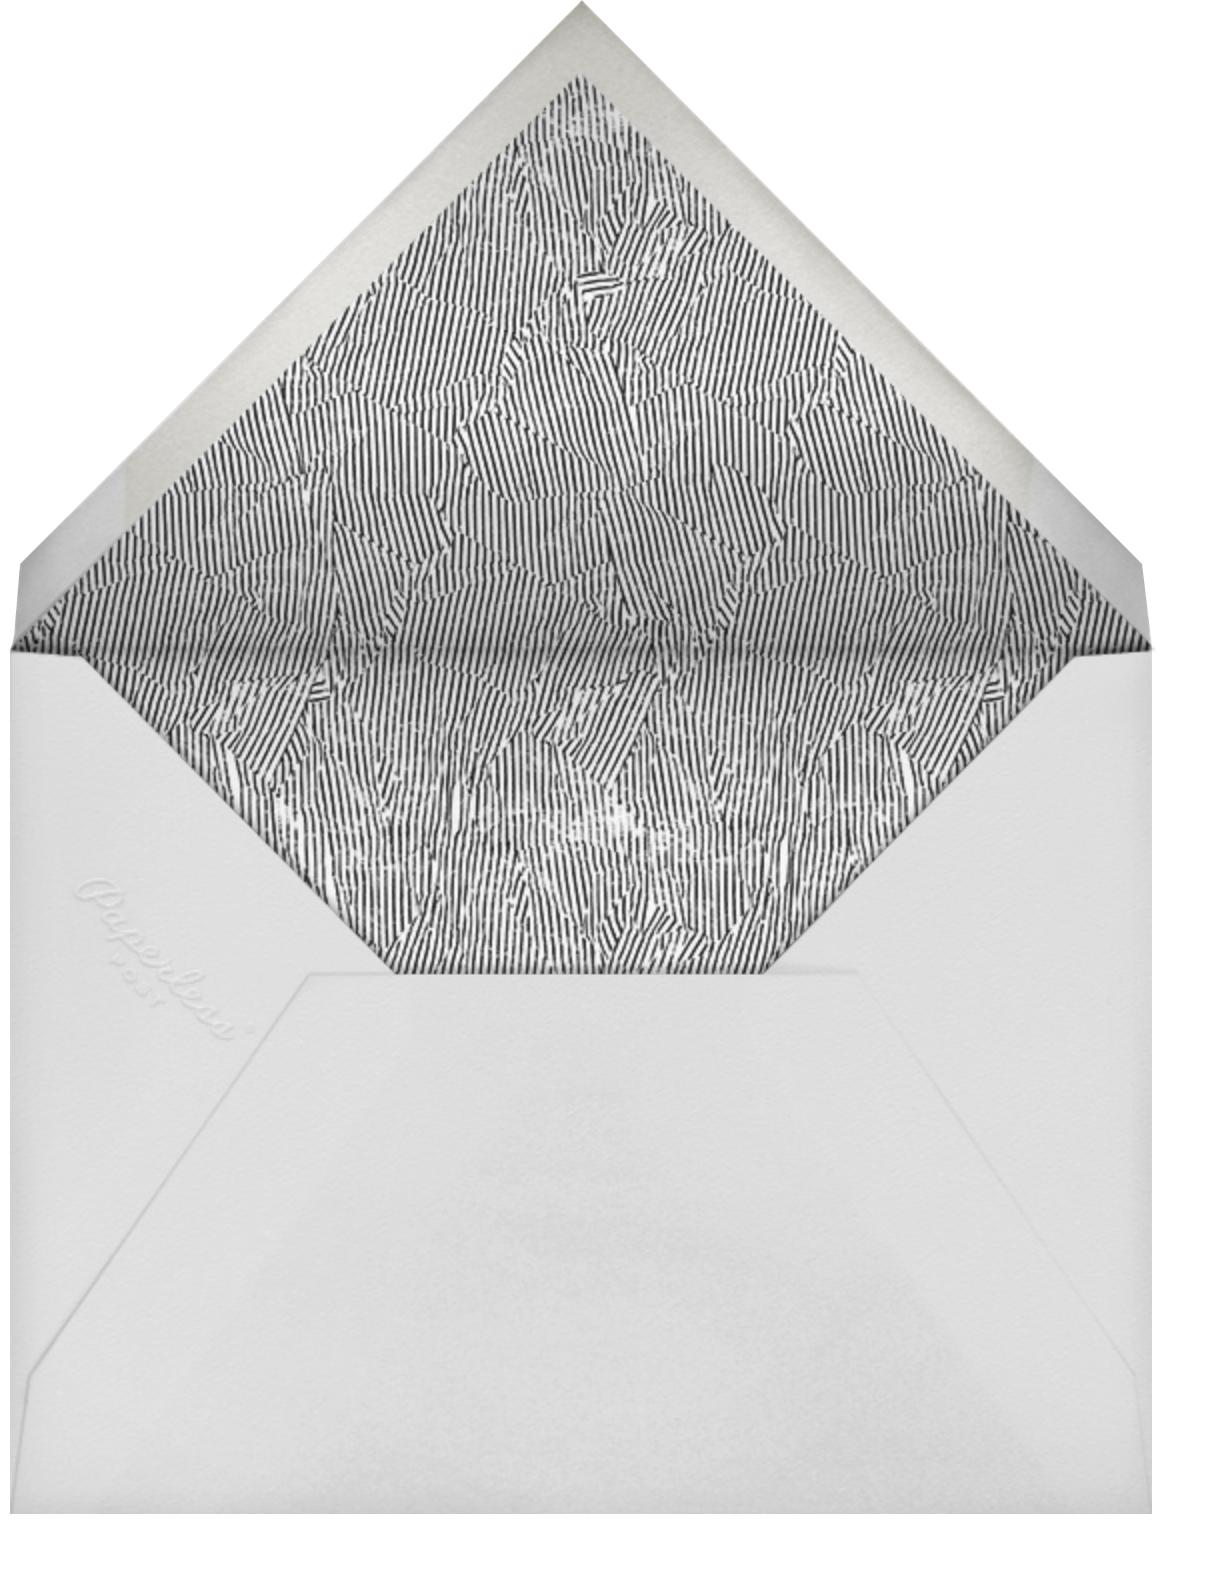 Tilt - Gold - Kelly Wearstler - Save the date - envelope back